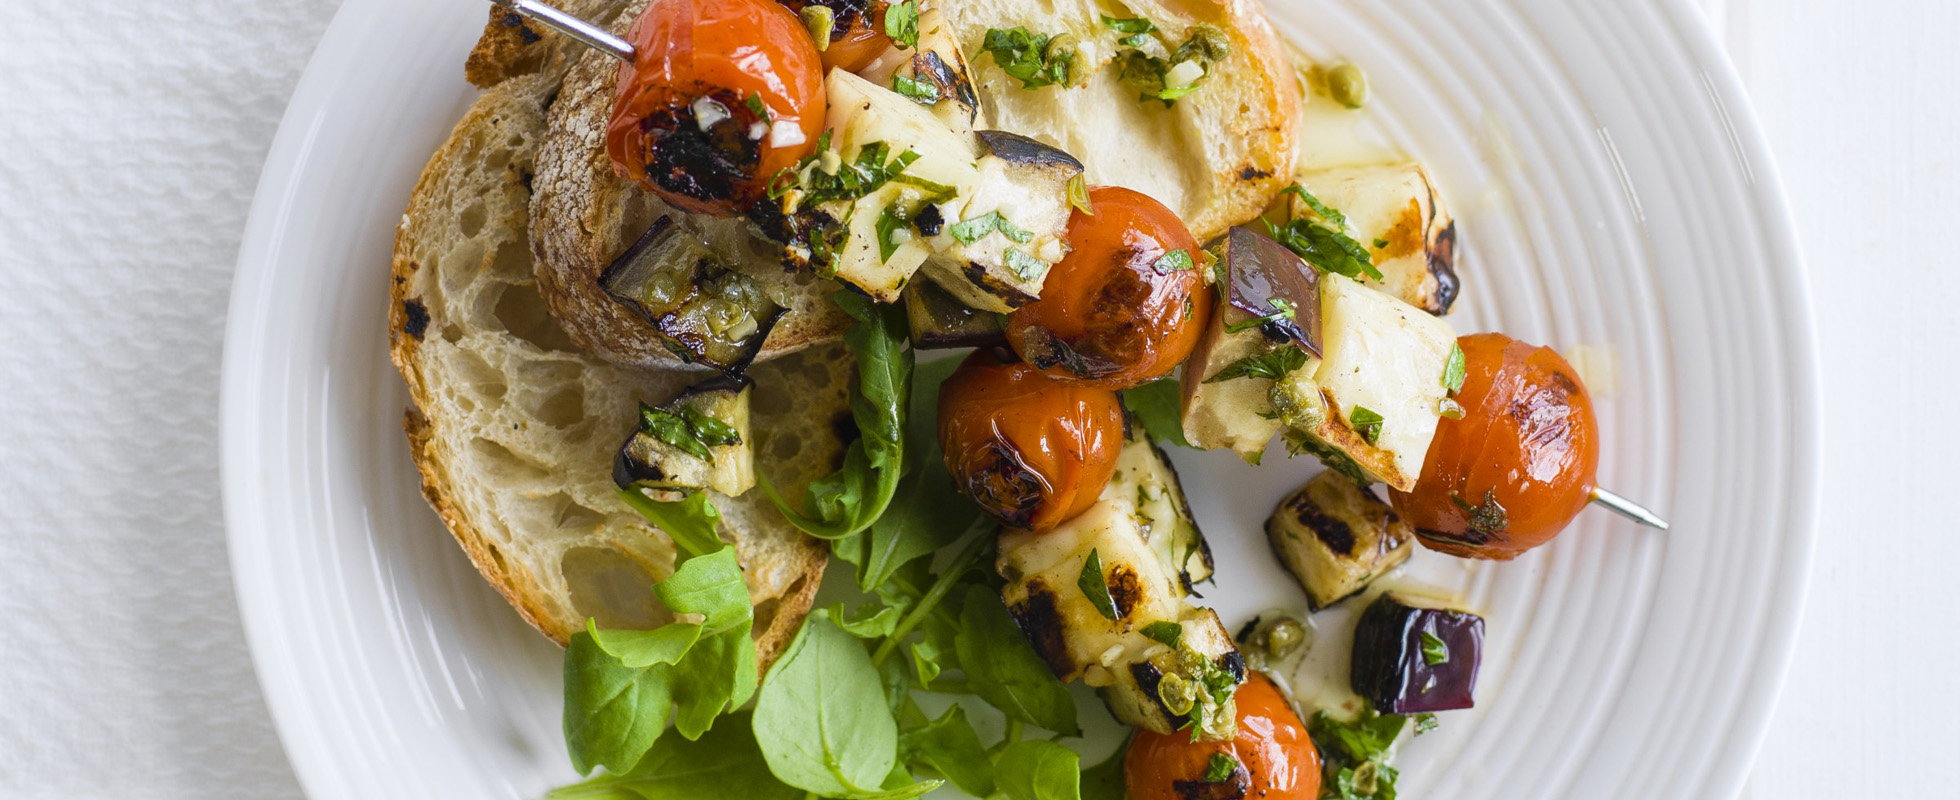 Halloumi, tomato and aubergine skewers